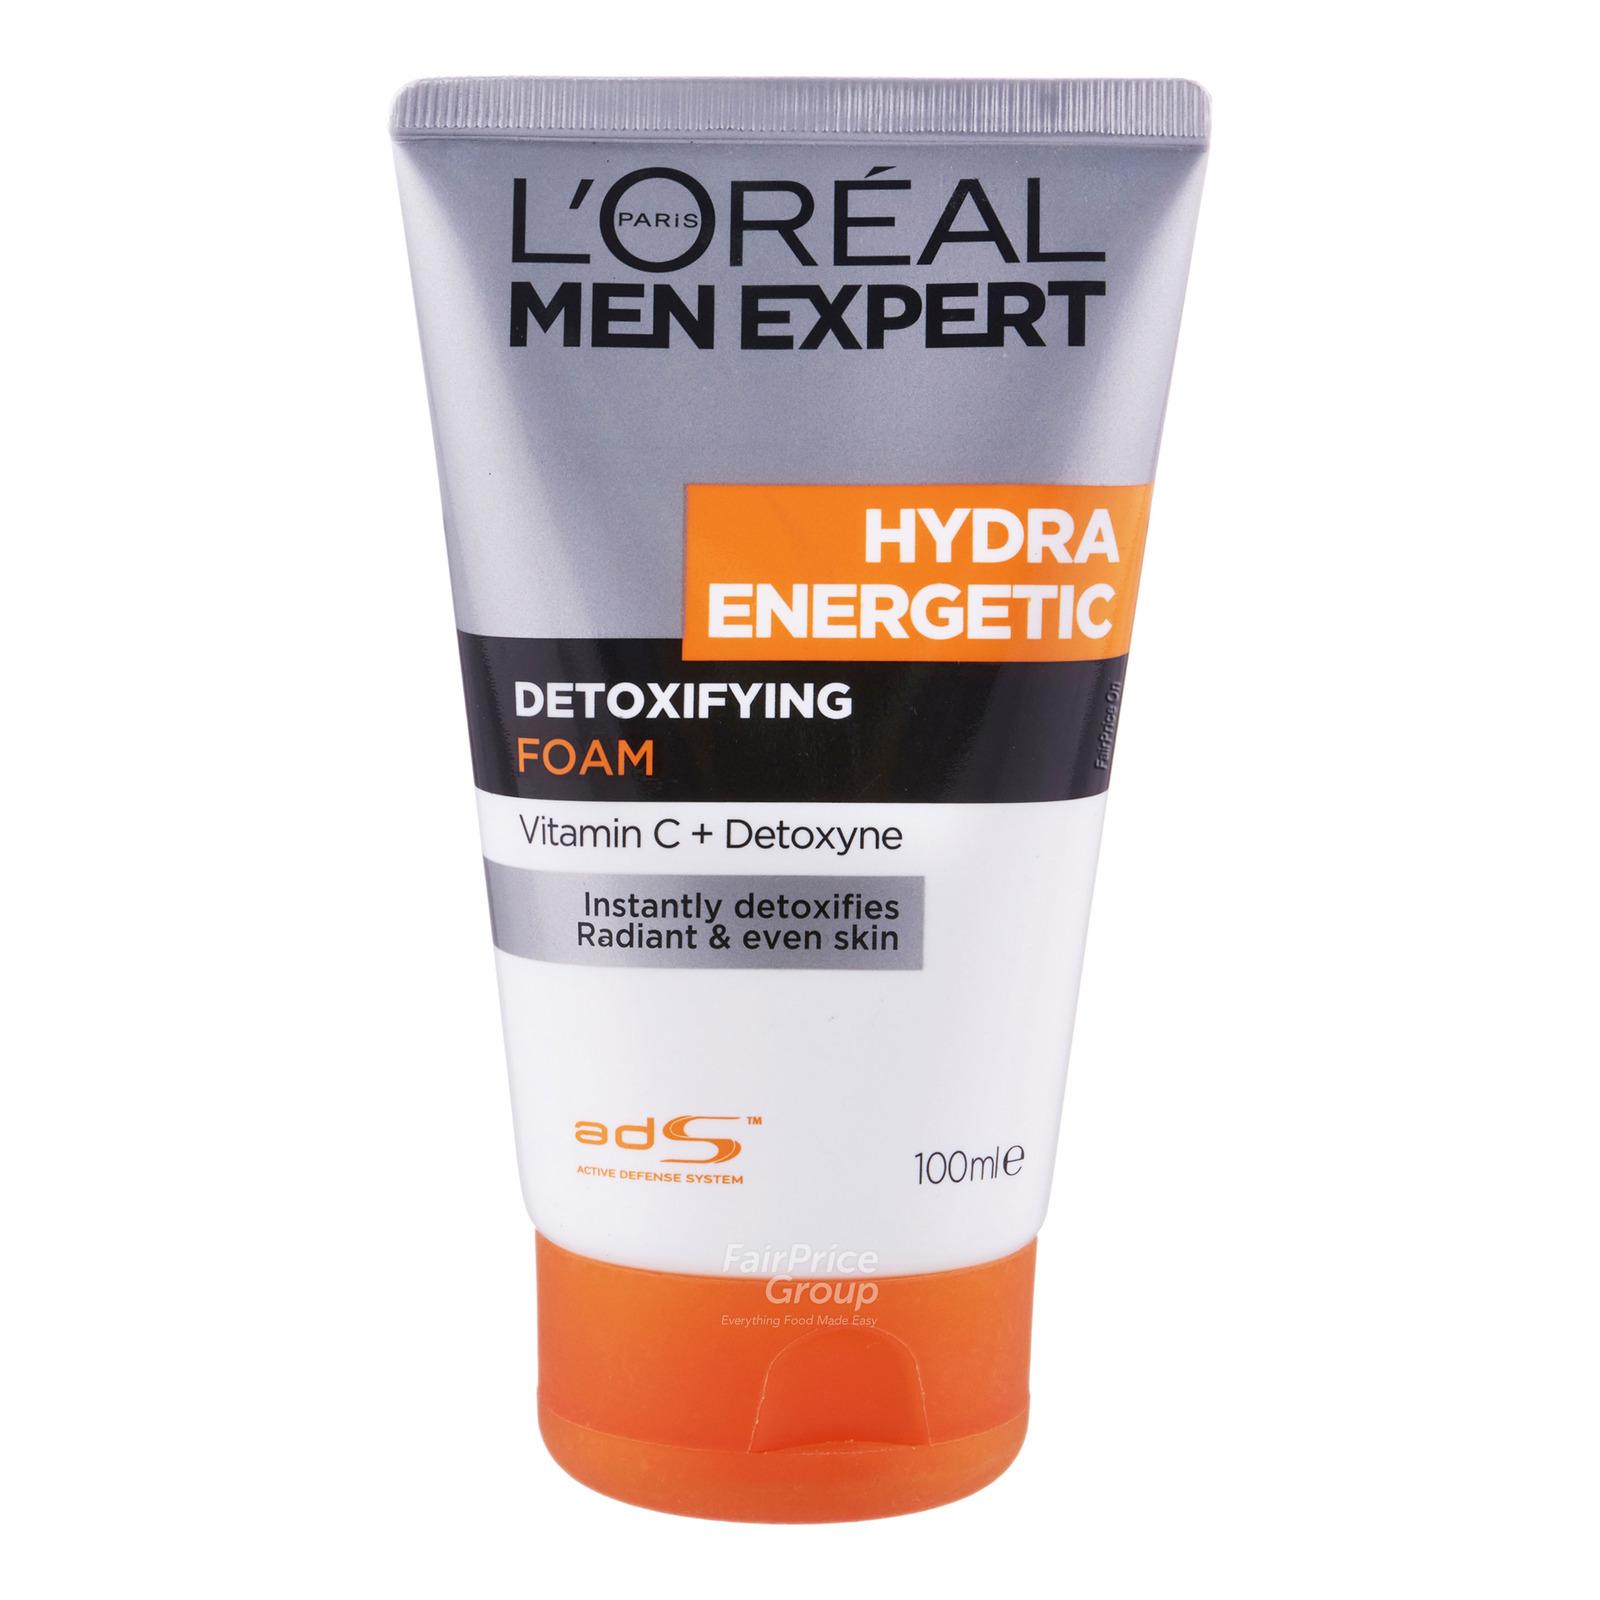 L'Oreal Men Expert Foam Wash - Hydra Energetic